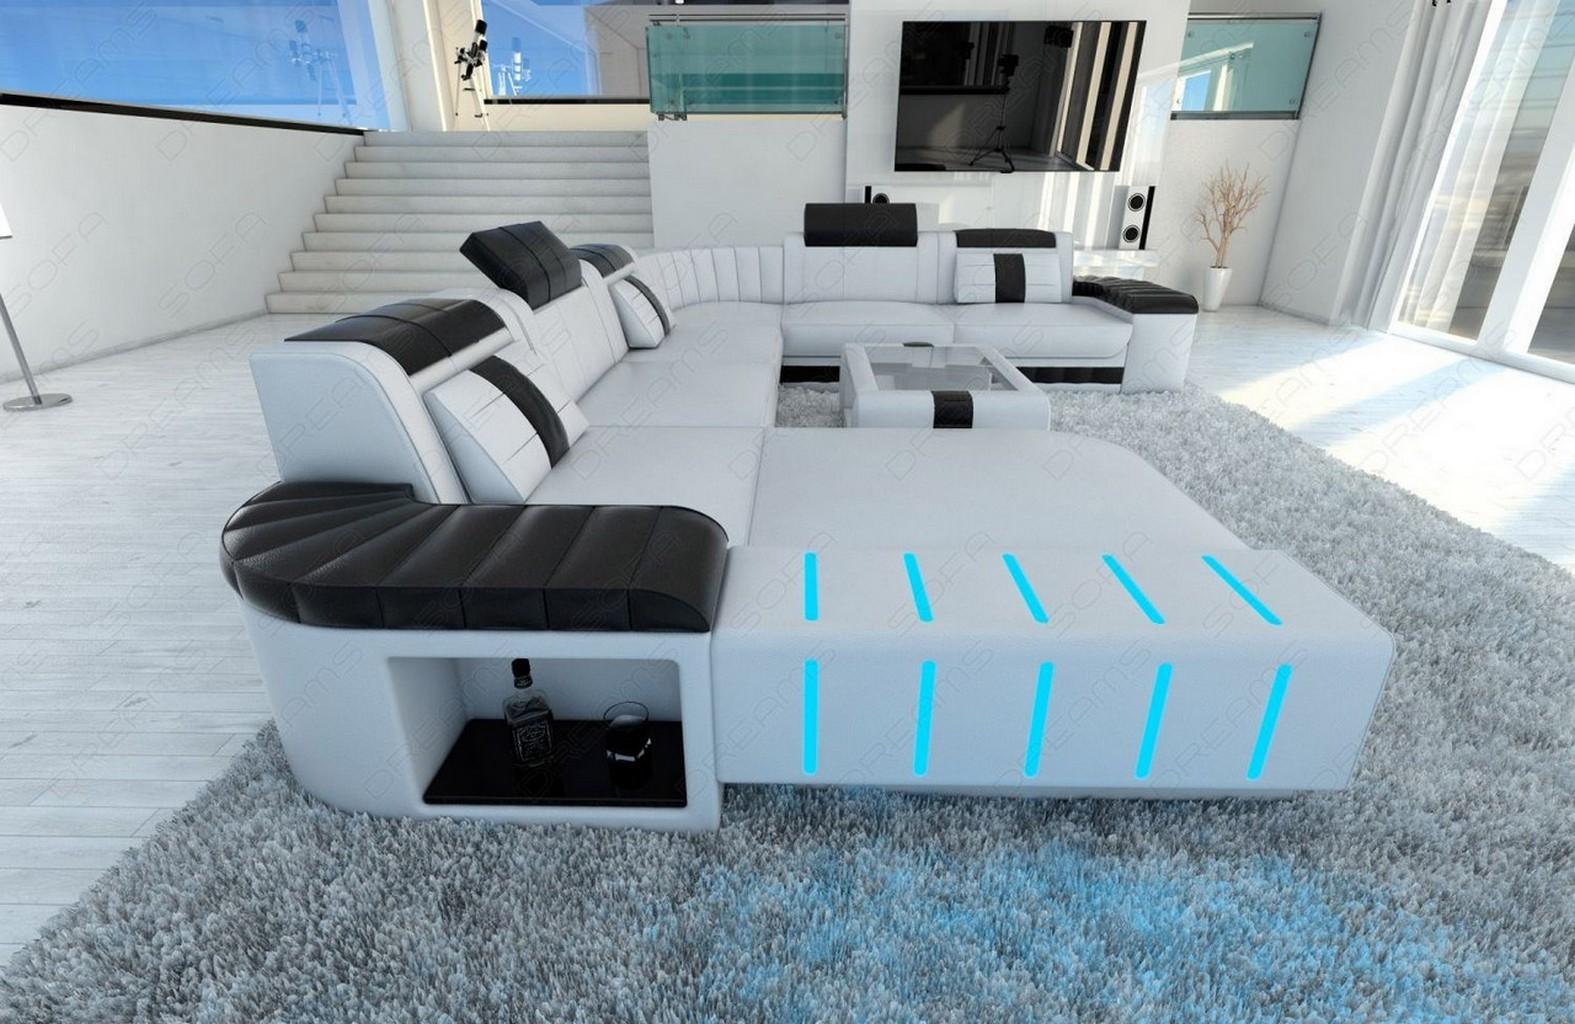 Astounding Xxl Couch Ideen Von Article Description